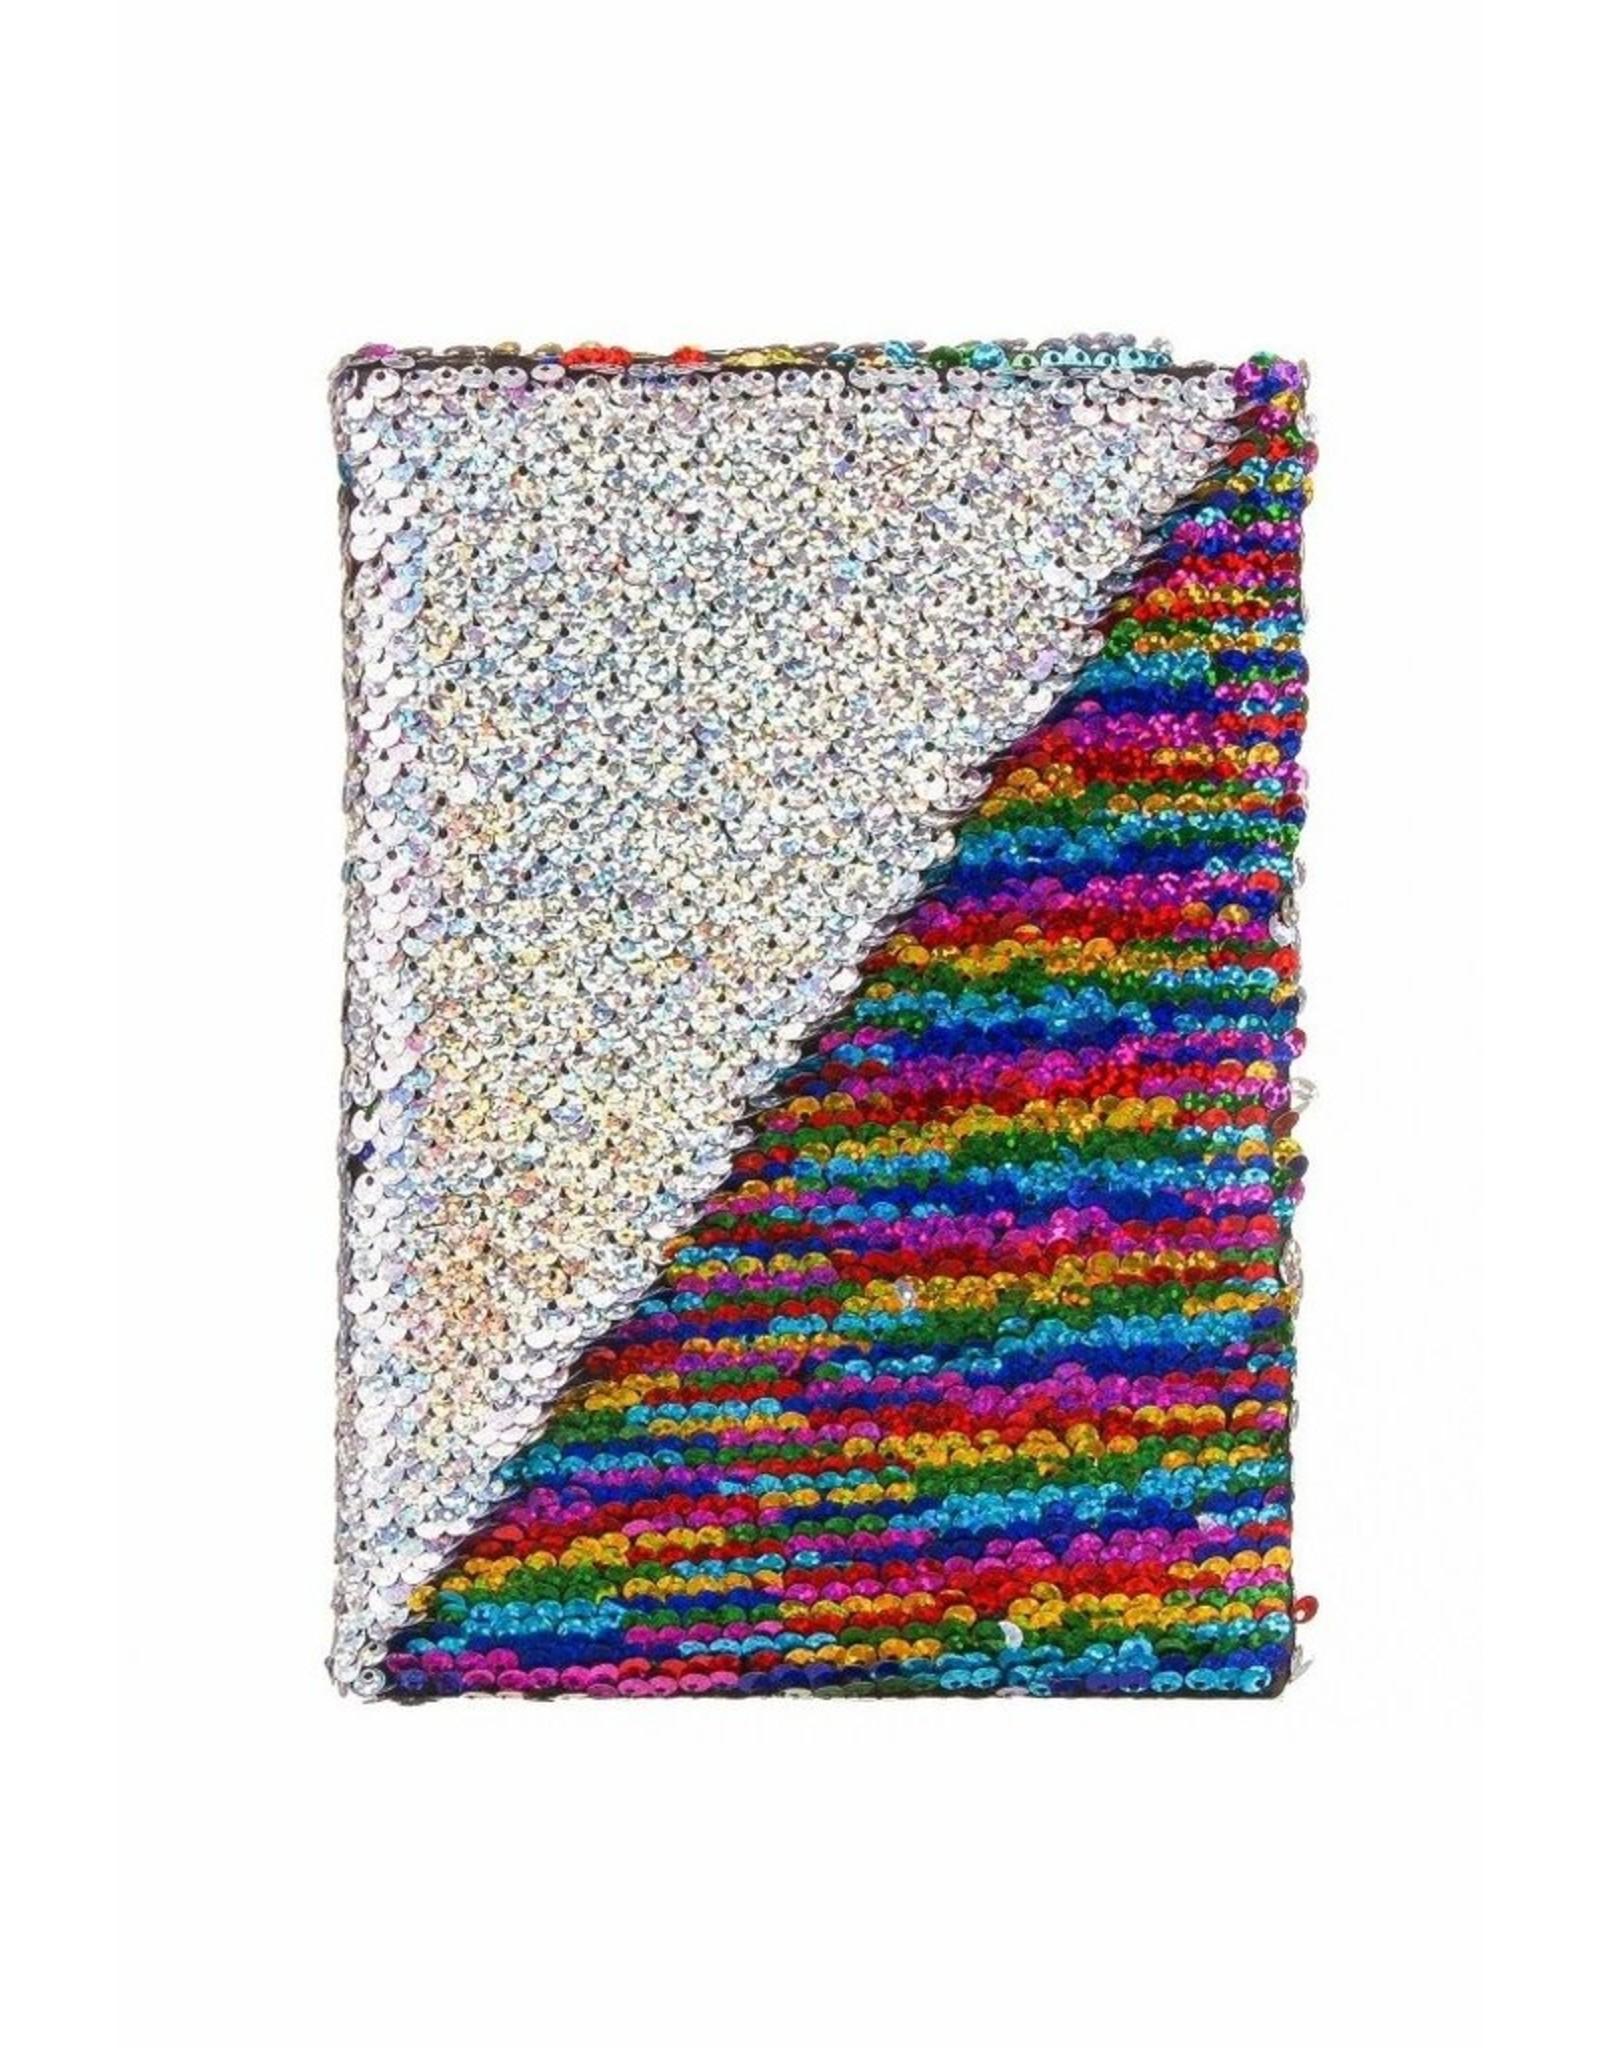 NPW Unicorn Sequin Notebook